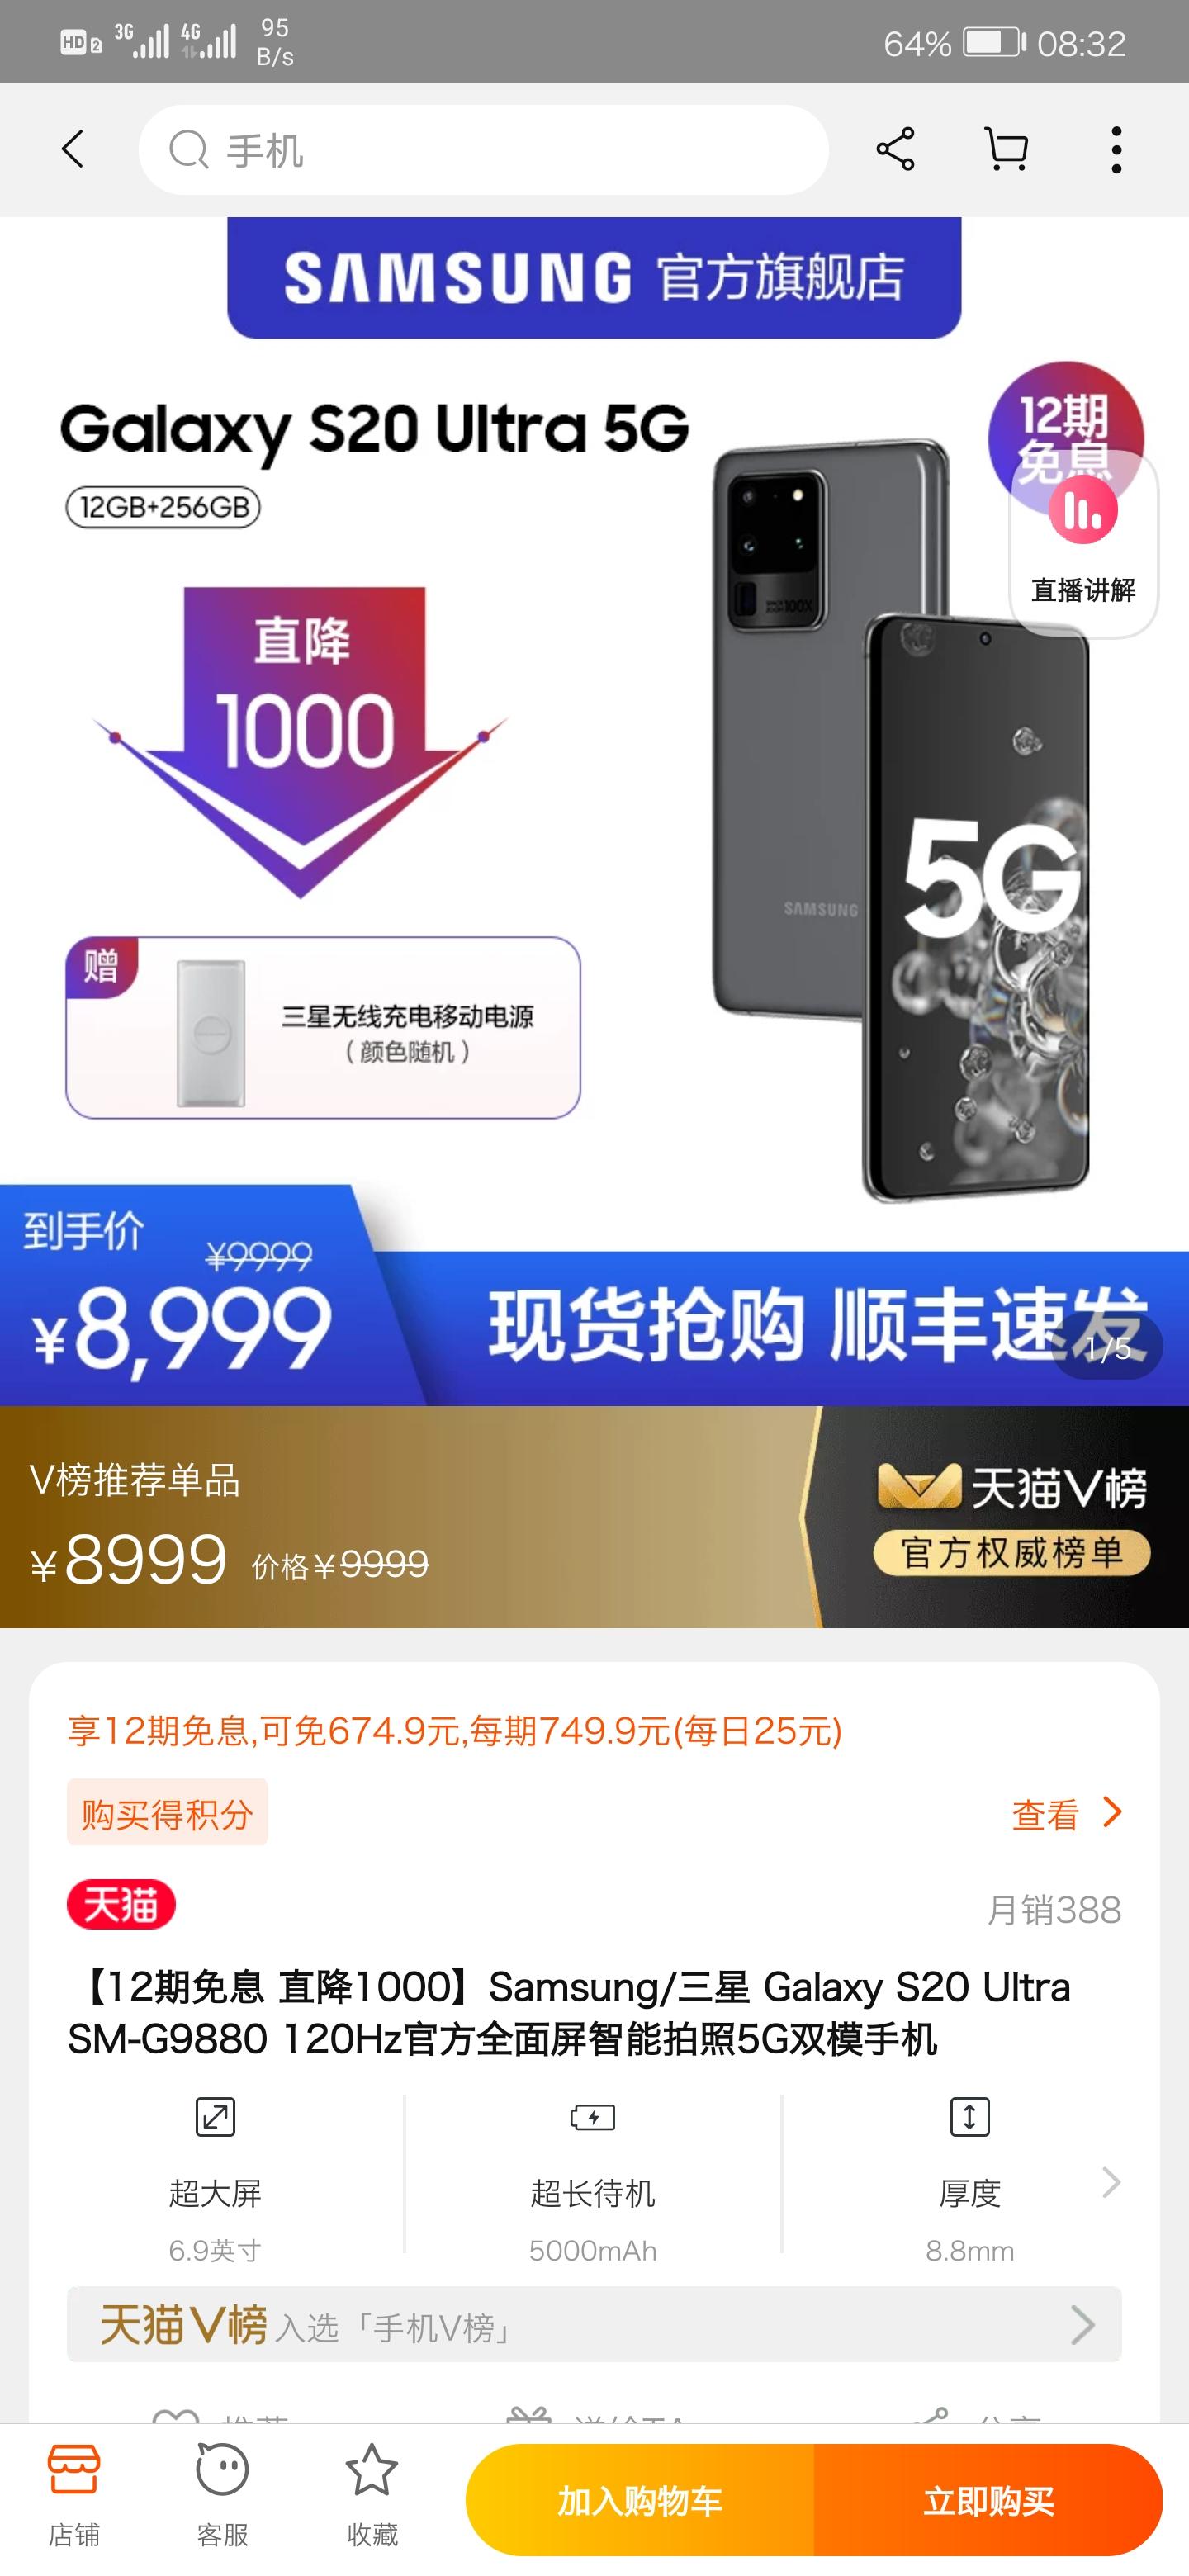 Screenshot_20201123_083236_com.taobao.taobao.jpg